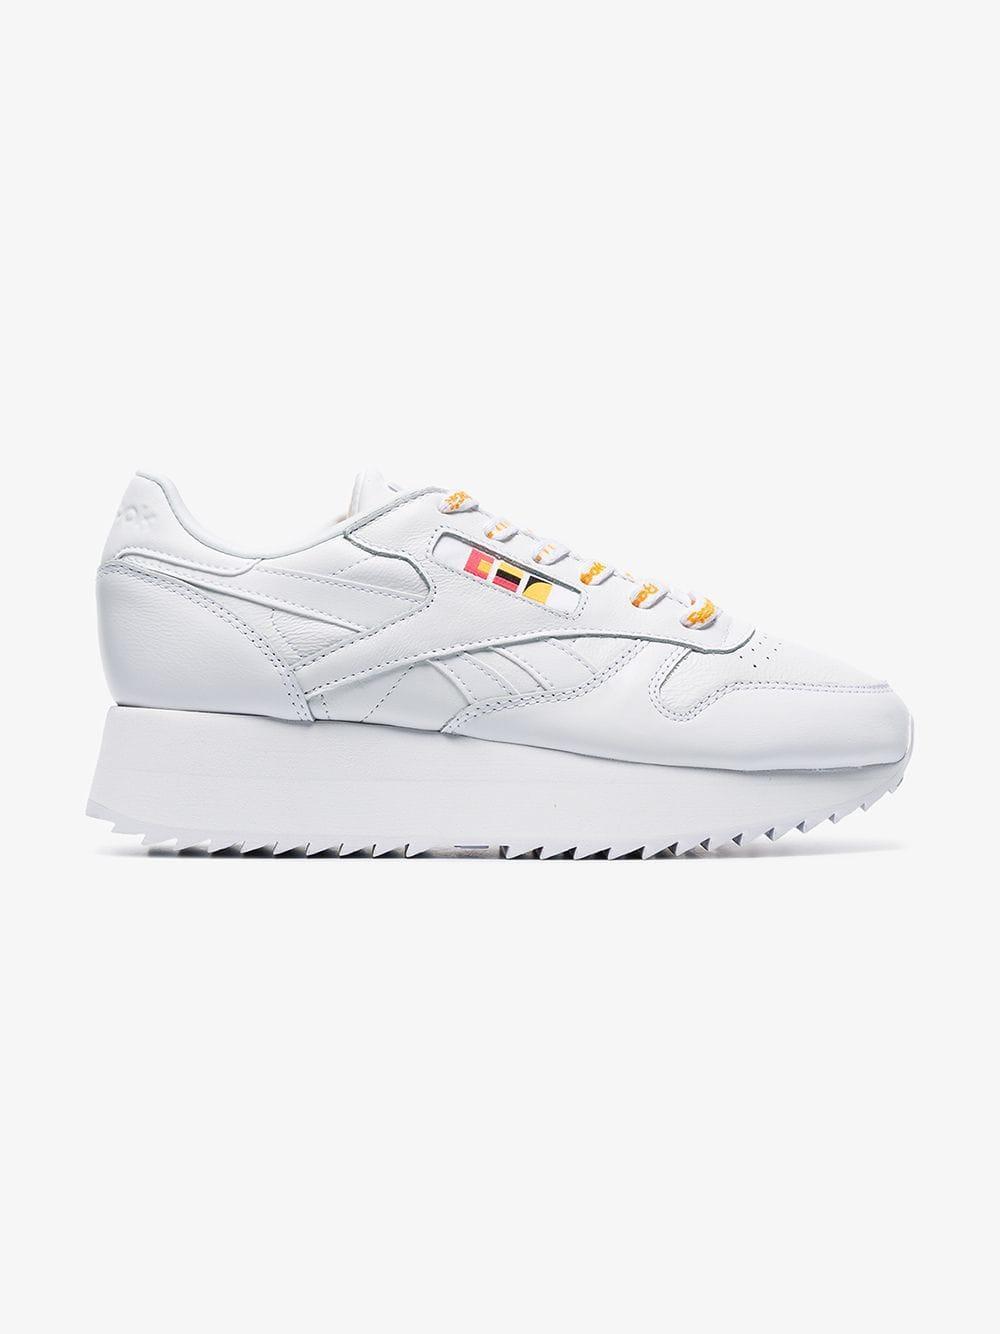 Reebok. Women s White X Gigi Hadid Classic Chunky Leather Low-top Sneakers 42414d6f3